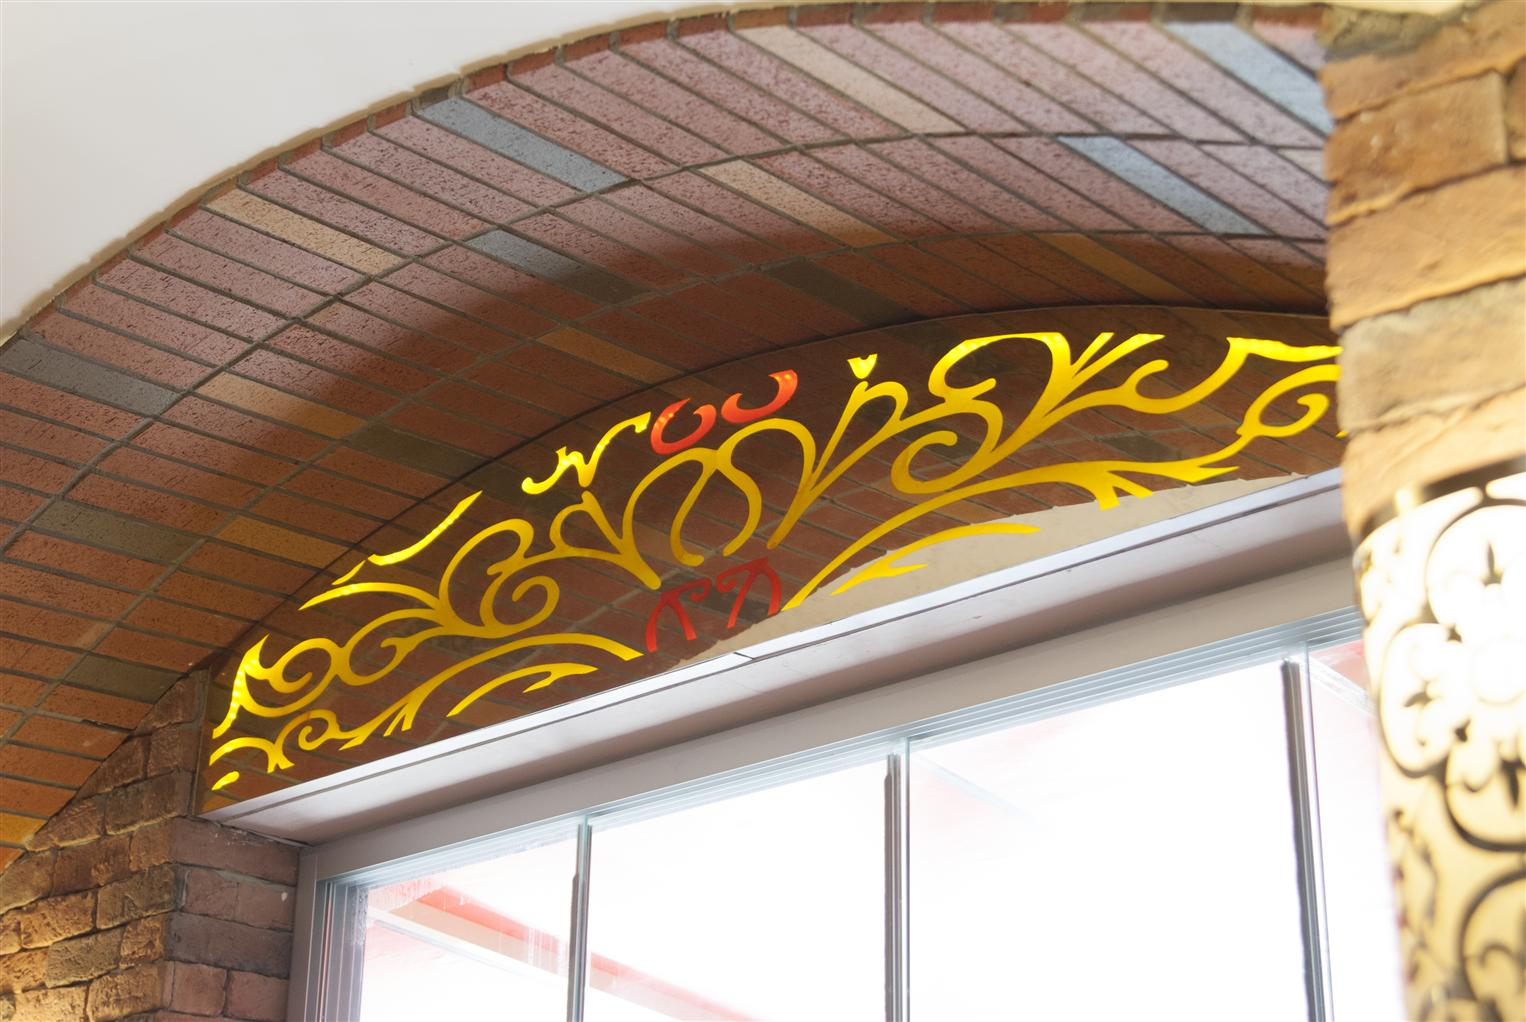 adria-cafe2015921173532760.jpg izmir vitray çalışması